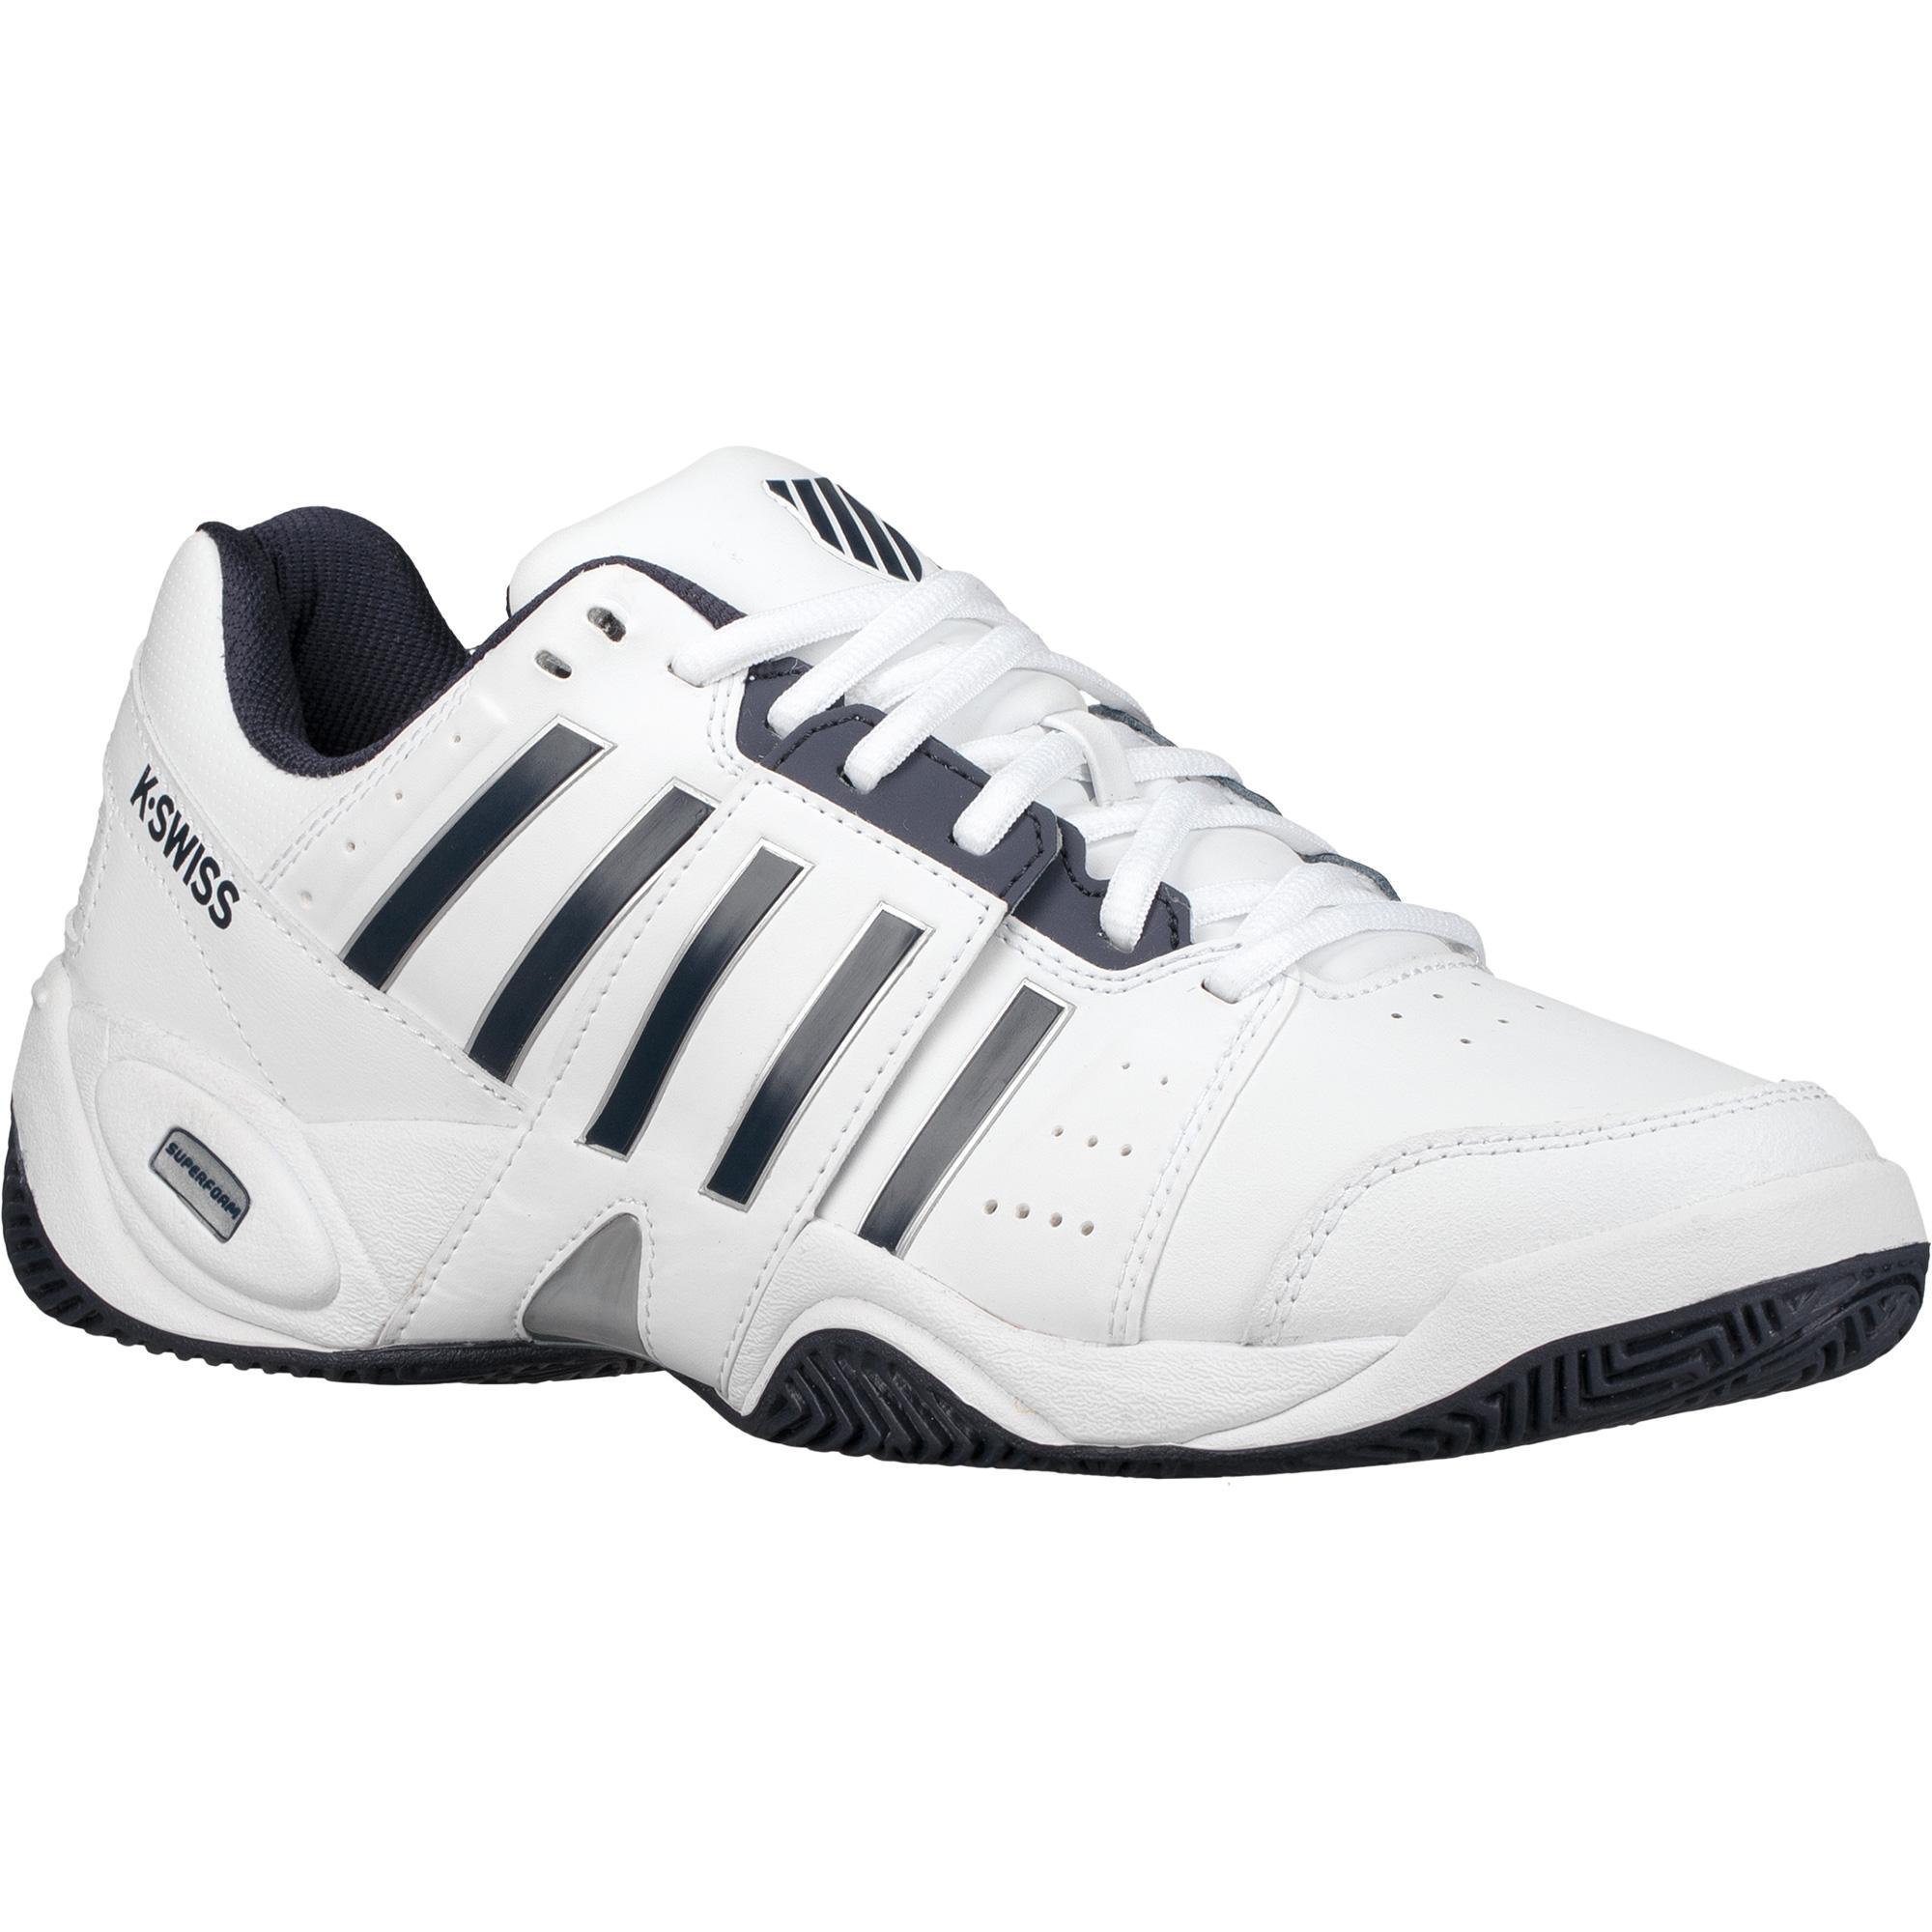 Mens Accomplish III Tennis Shoes, White K-Swiss